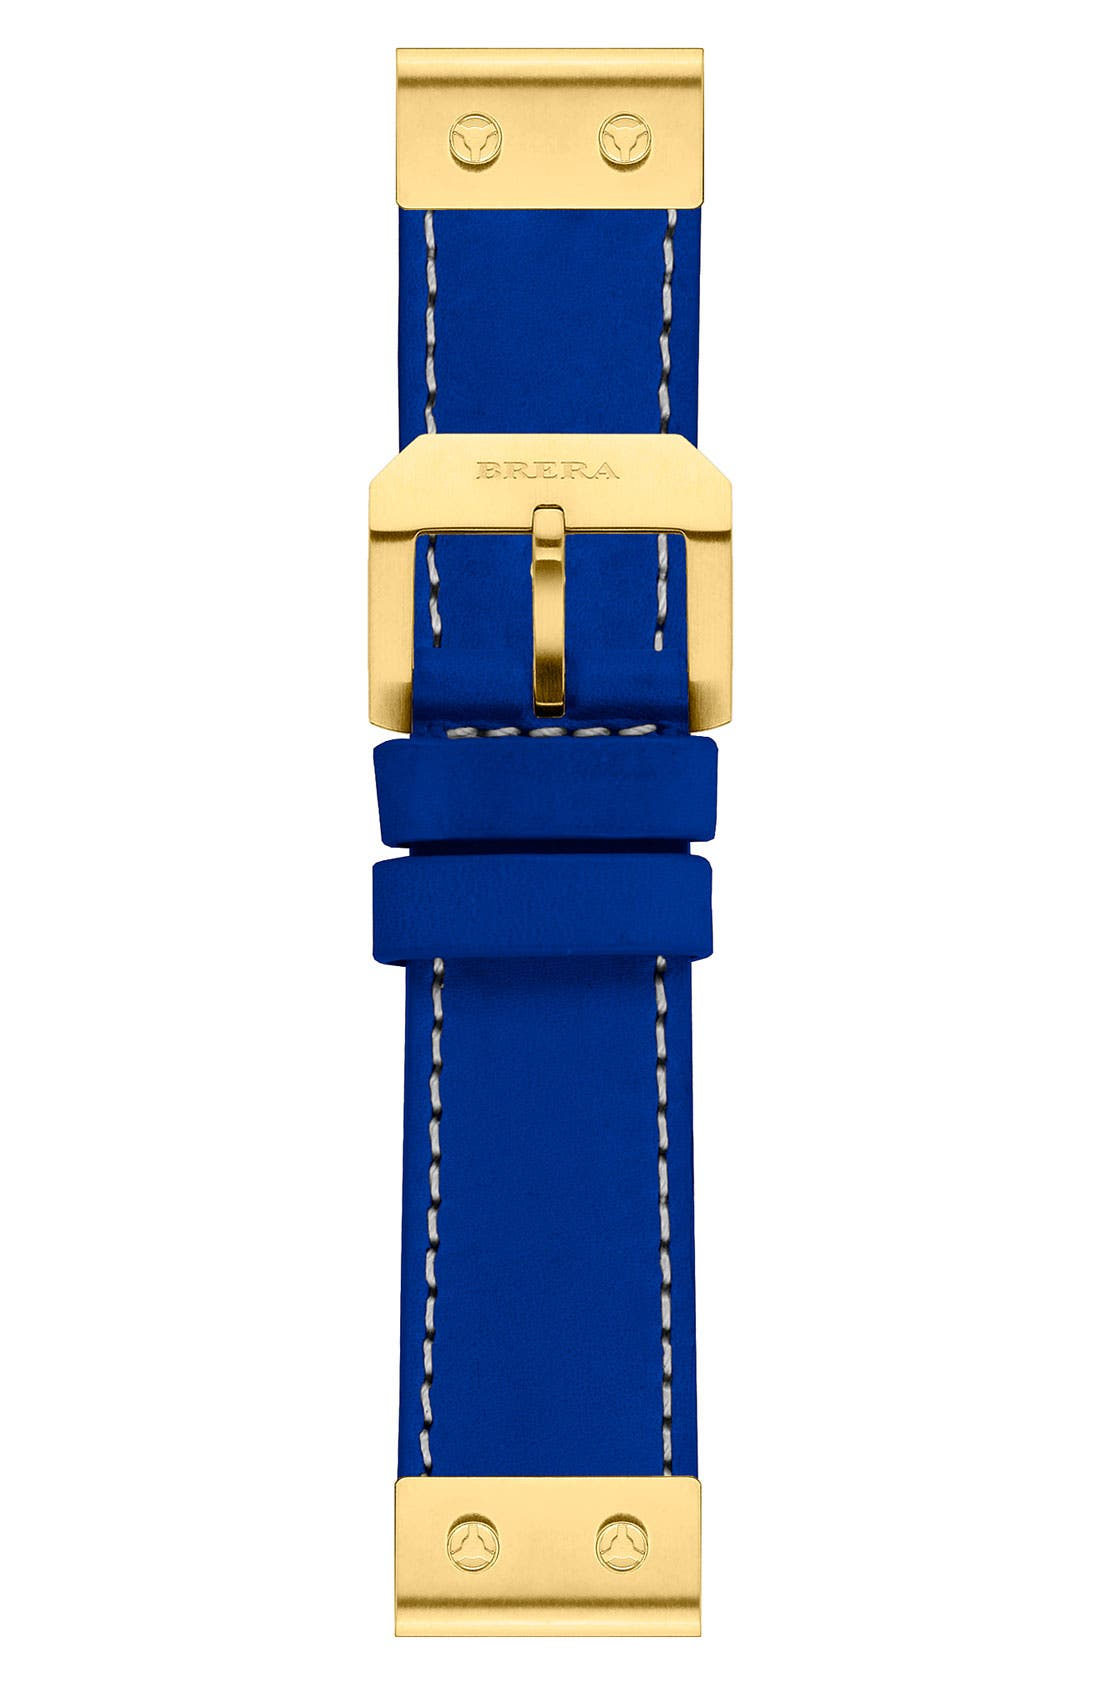 Main Image - Brera 22mm Calfskin Leather Watch Strap